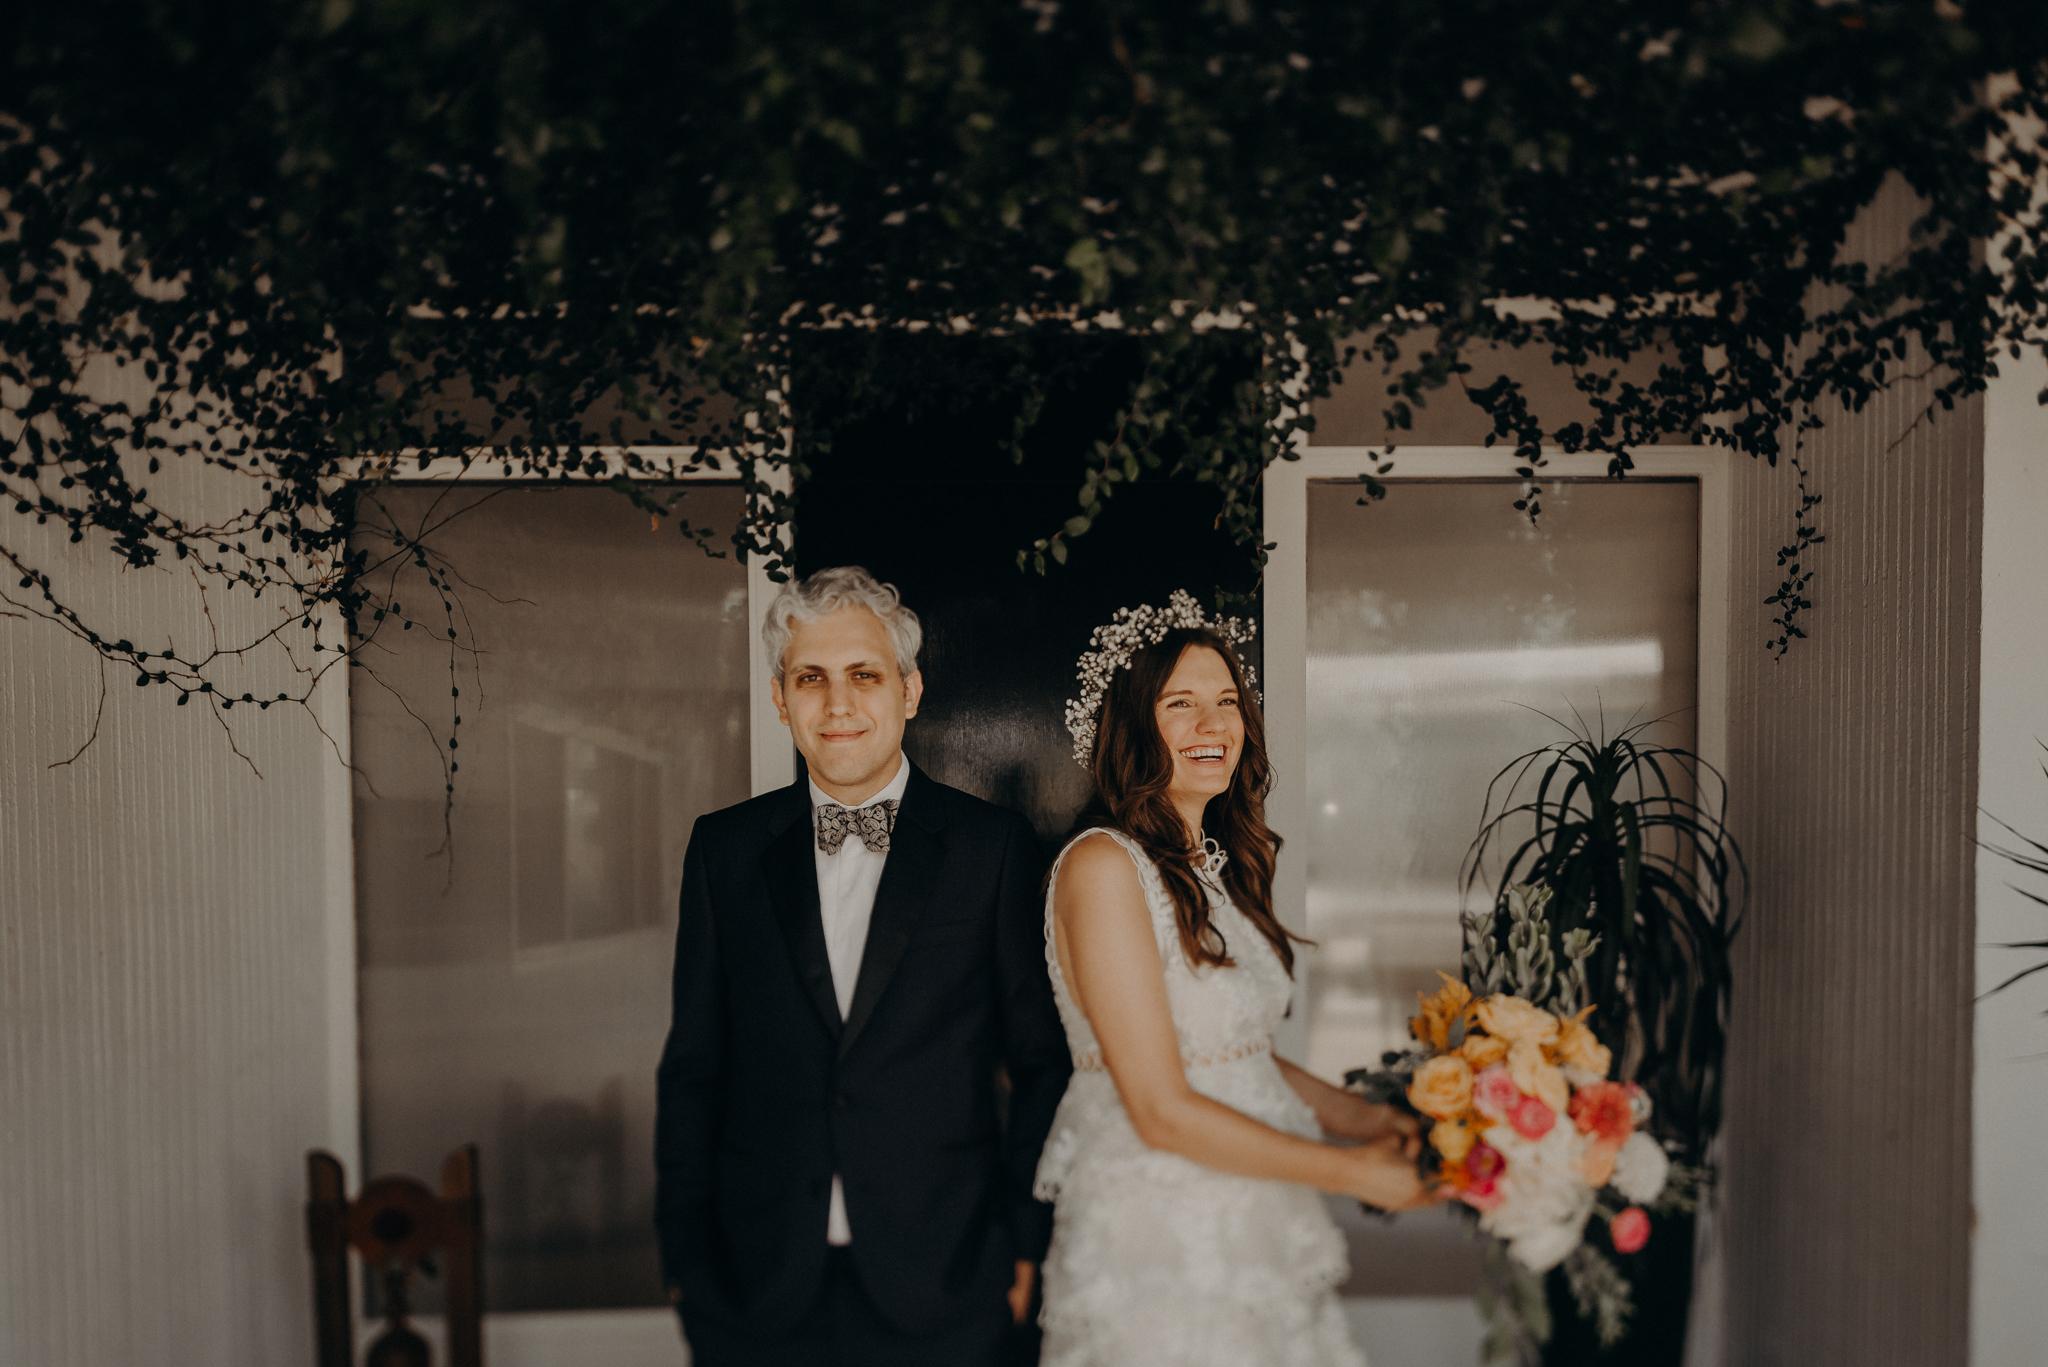 Isaiah + Taylor Photography - Private Estate Backyard Wedding - Beverly Hills - Los Angeles Wedding Photographer - 19.jpg